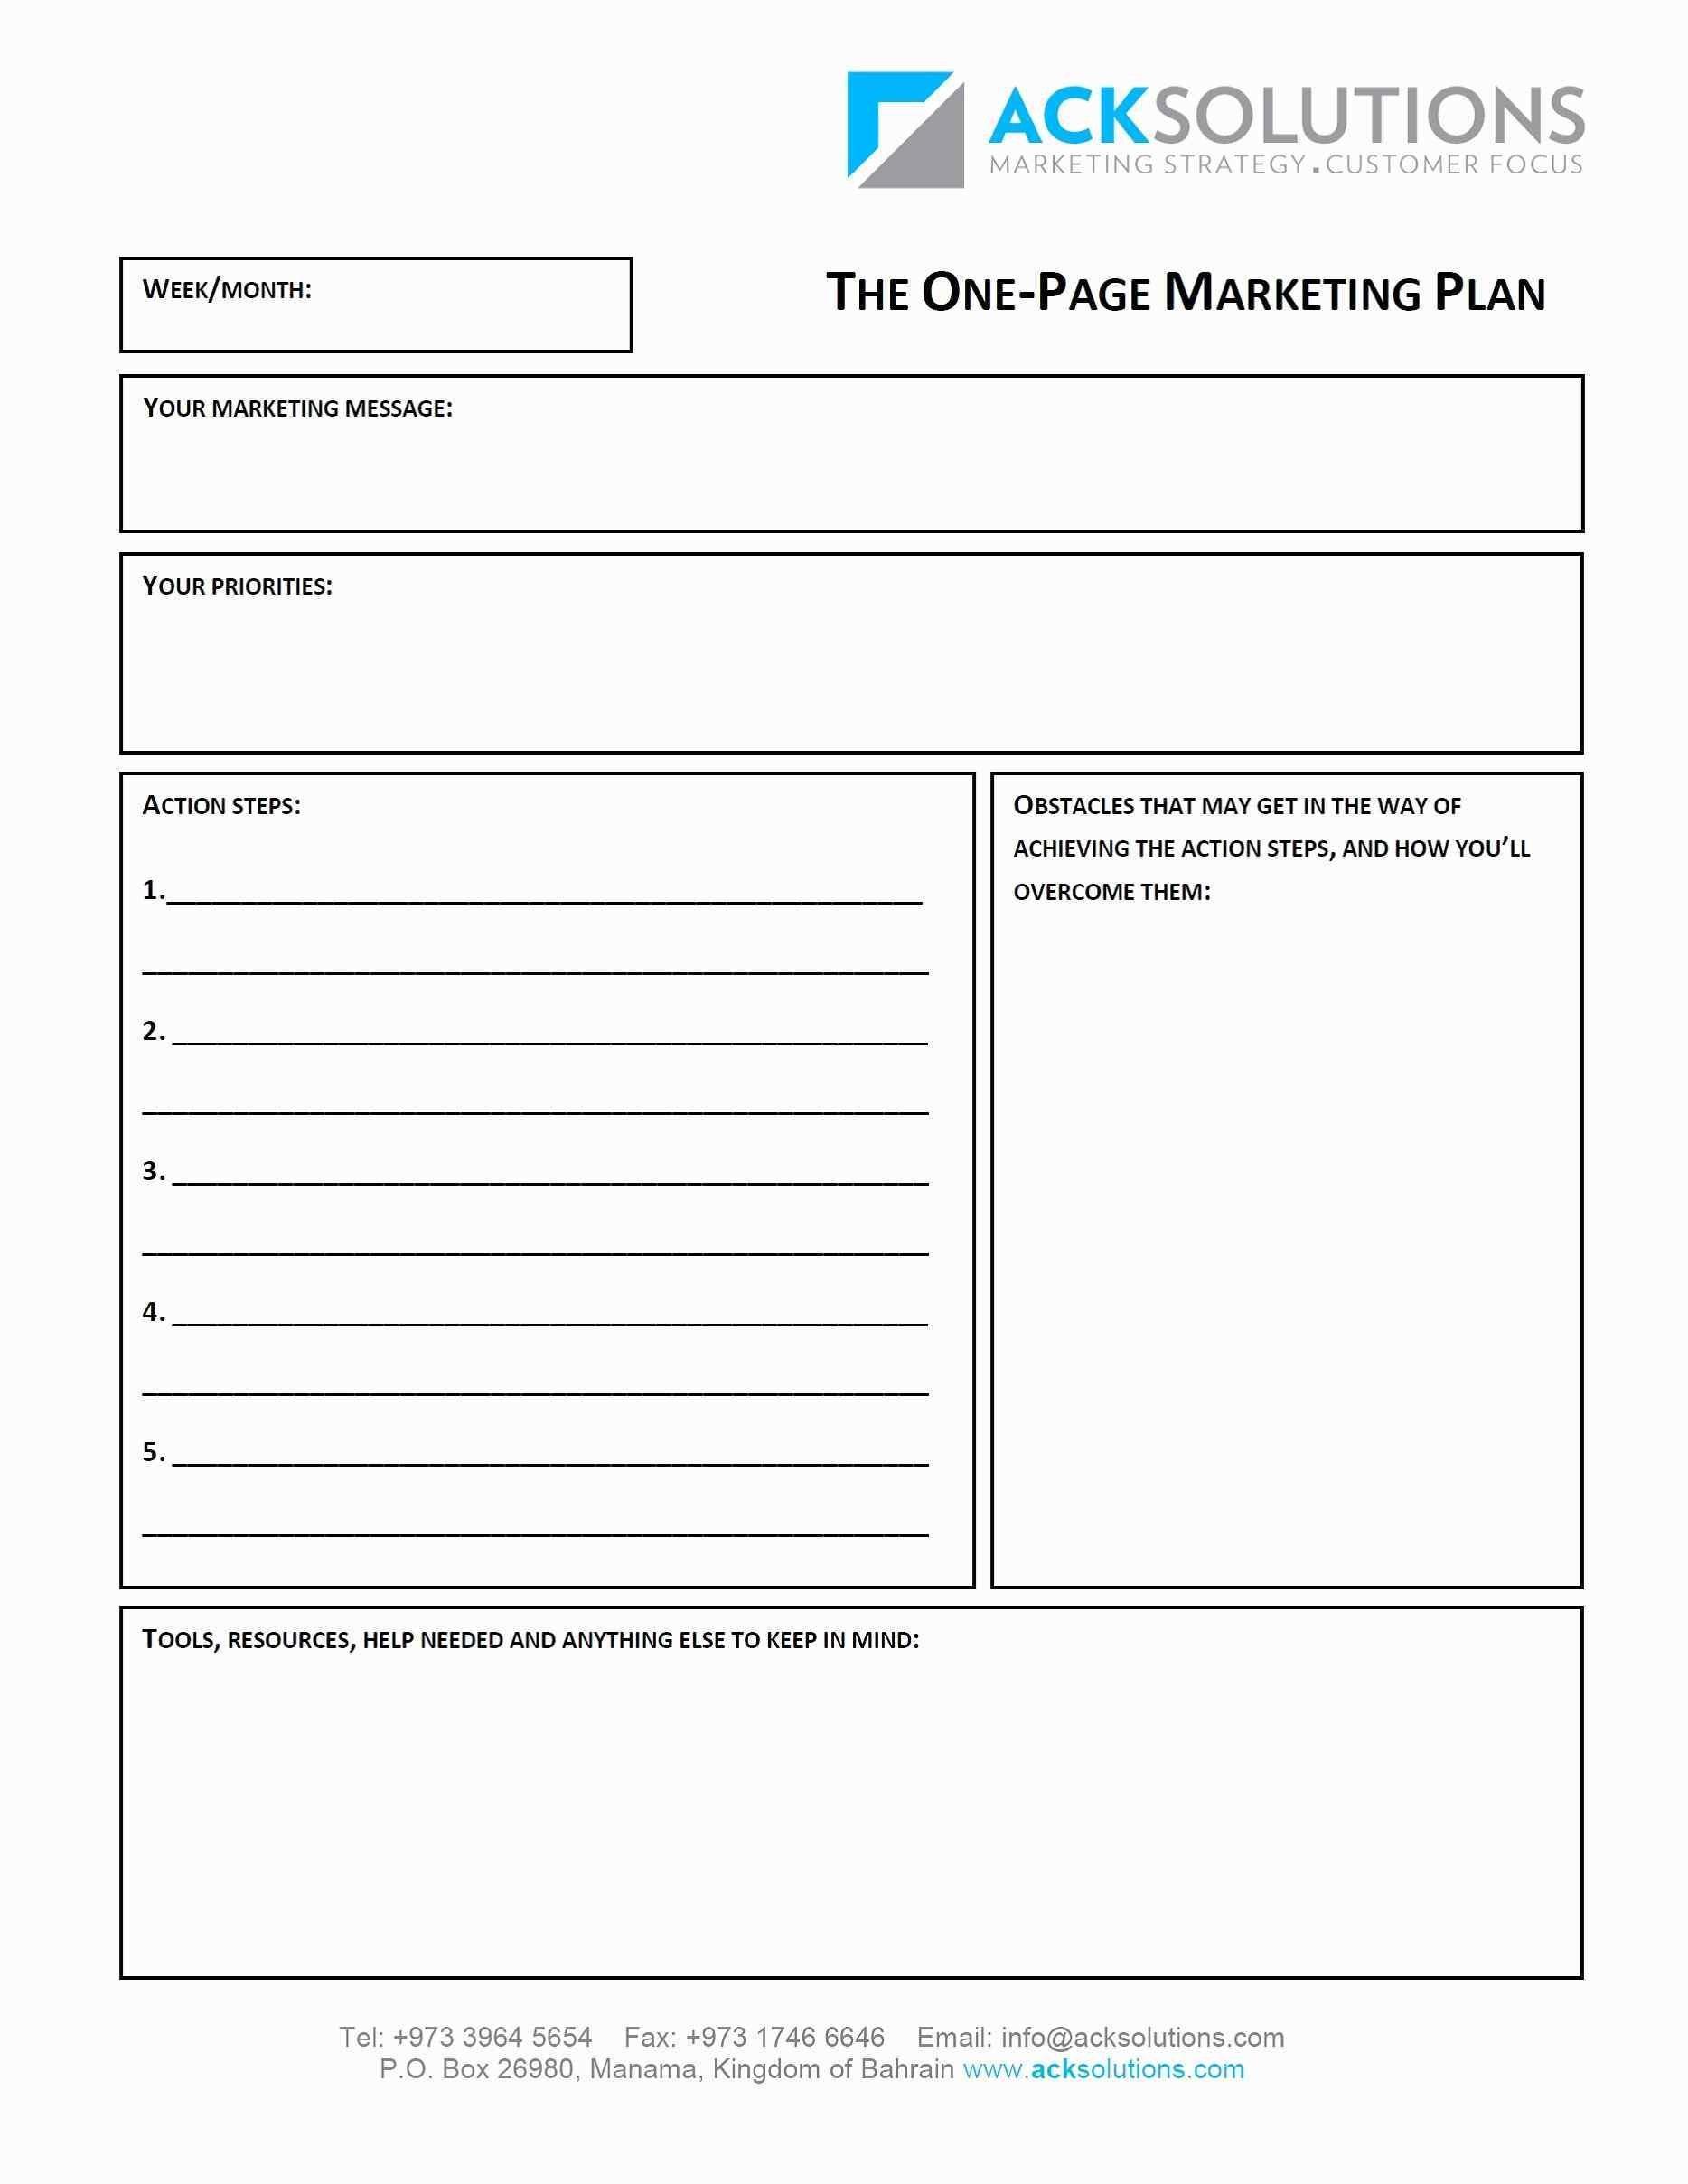 Basic Business Plan Template Uk Inspirational Simple Restaurant Regarding Free Business Plan Template Australia